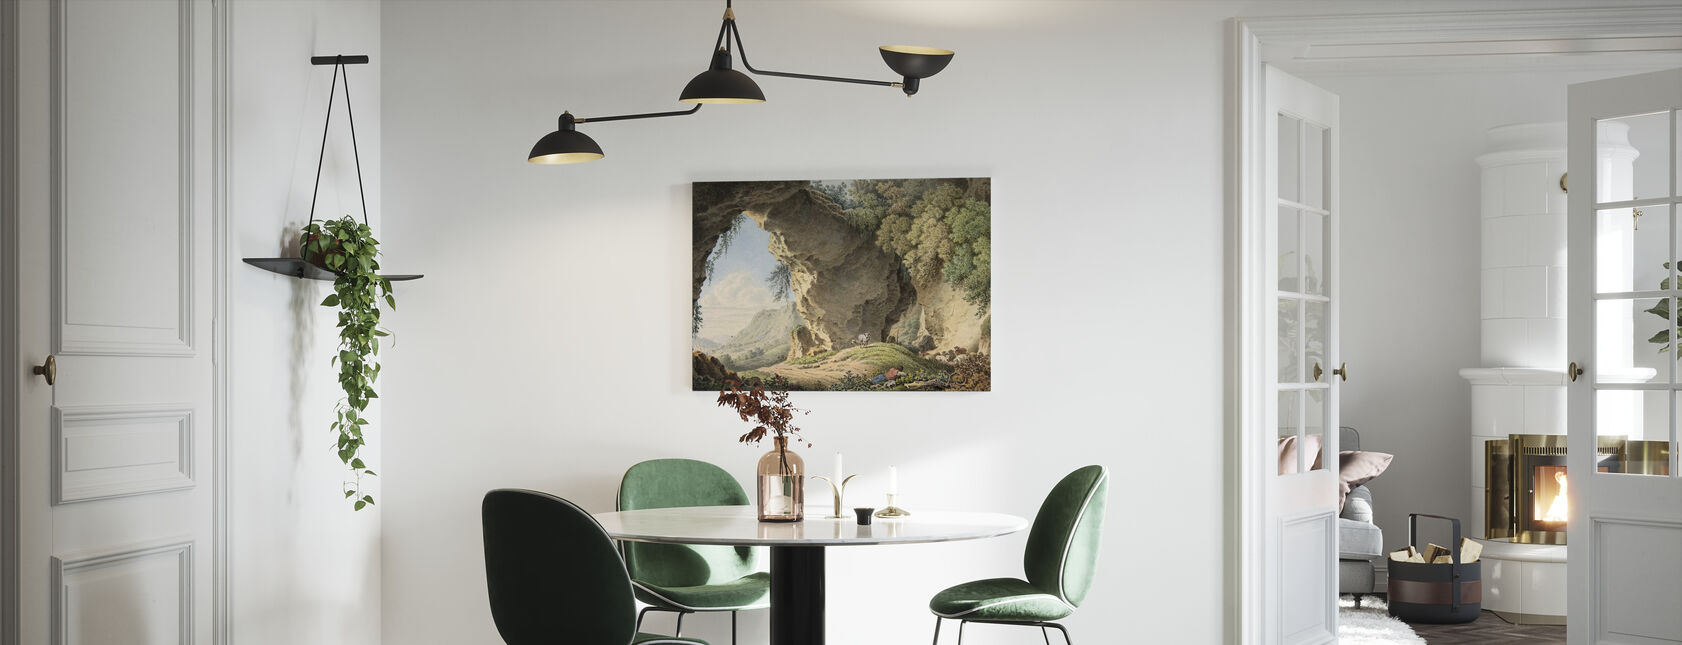 Rotsachtig landschap - Philip Heinrich Dunker - Canvas print - Keuken